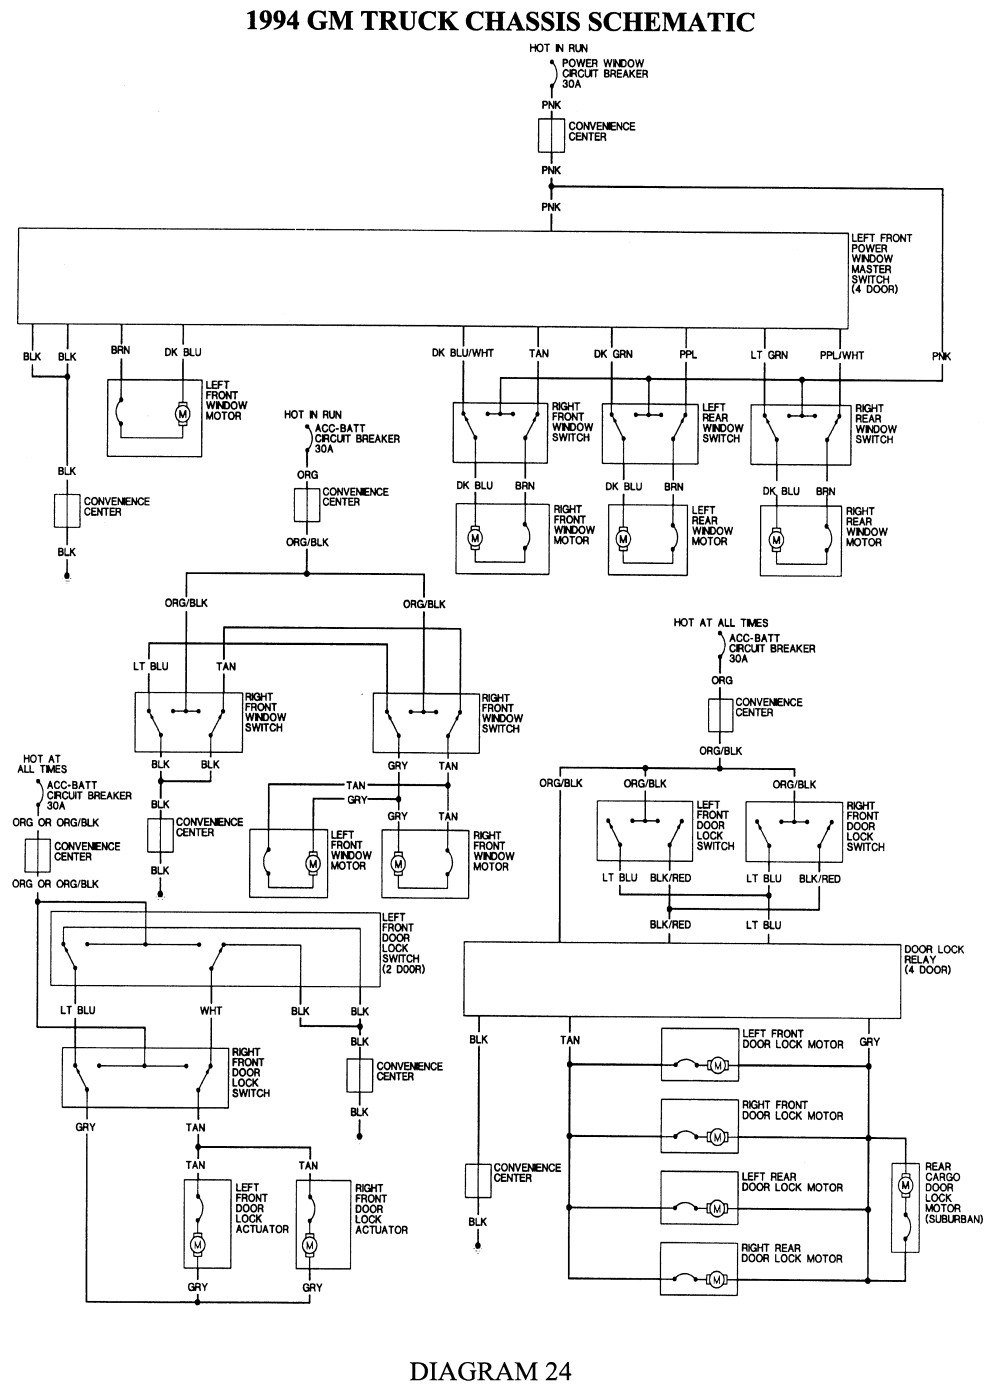 Chevy Radio Wiring Diagram | Wirings Diagram on 2005 trailblazer radio, 02 tacoma radio, 02 mustang radio, 02 cavalier radio, 02 montana radio, 02 corvette radio, 02 sable radio, 02 silverado radio, 02 explorer radio,